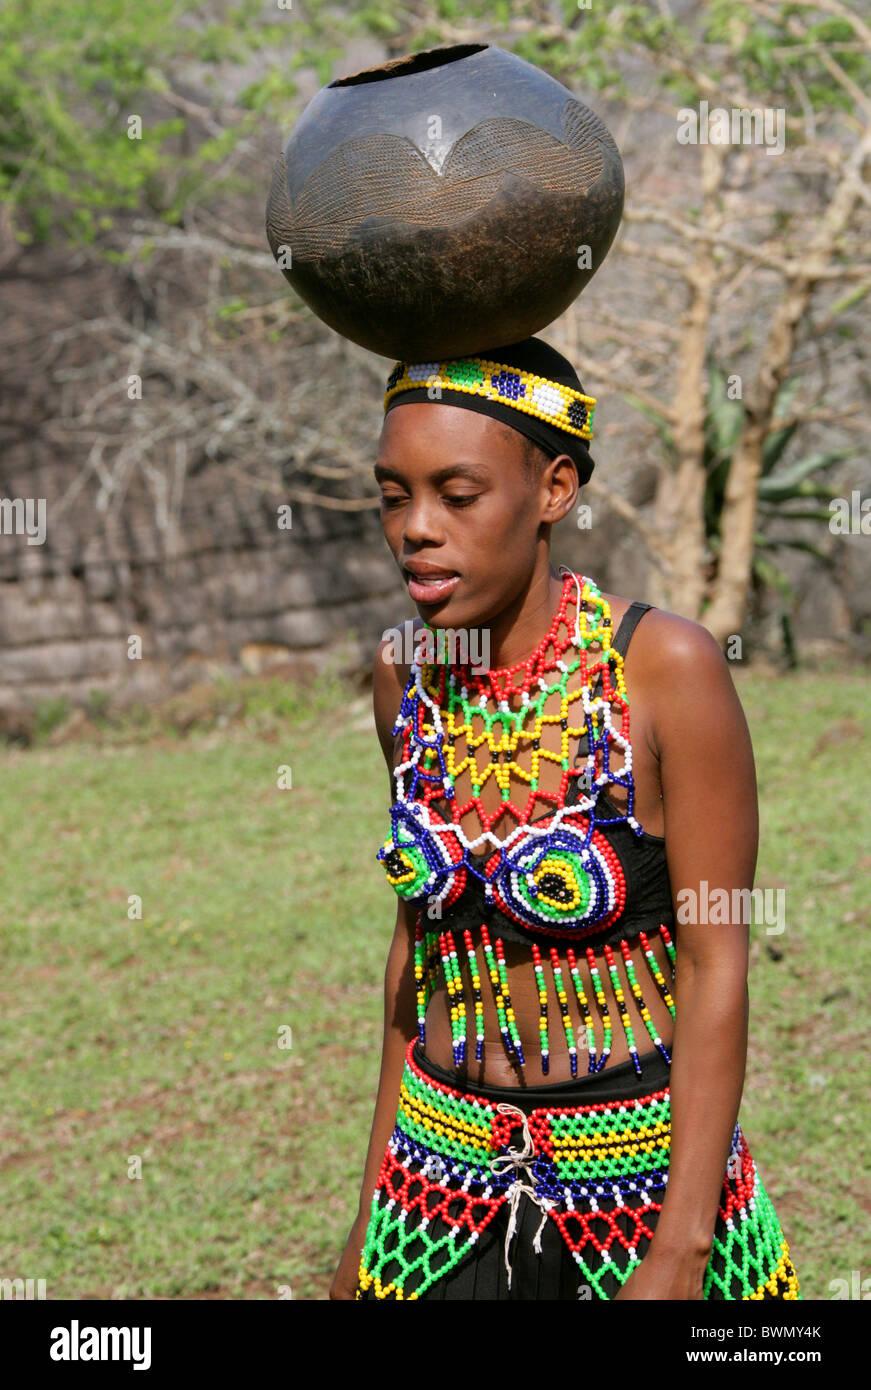 Zulu traditional dress in zulu kraal kwazulu natal -  Young Zulu Maiden In Traditional Beaded Dress Shakaland Zulu Village Nkwalini Valley Kwazulu